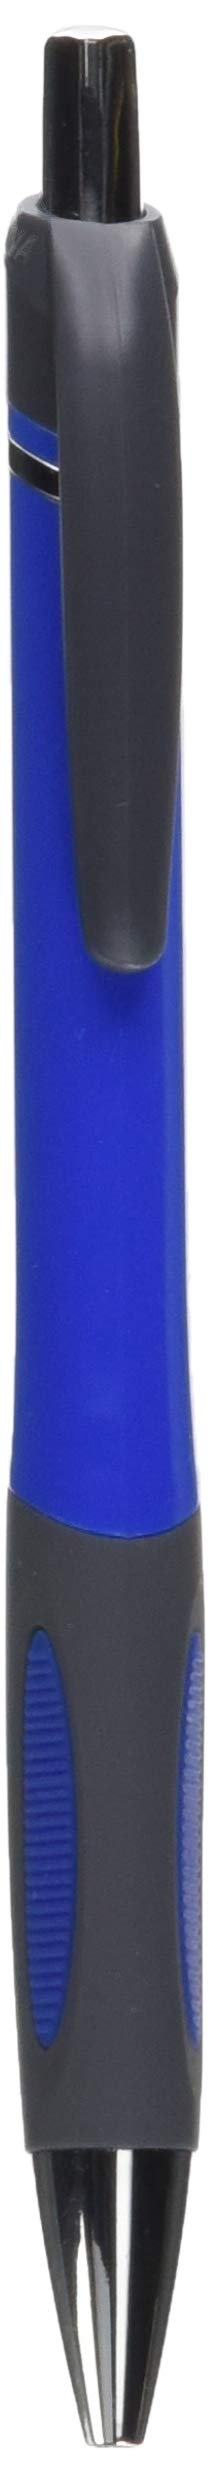 Logotastic Sleek Write Vigor Pen - Blue - (Case Pack of 250) by Logotastic (Image #1)